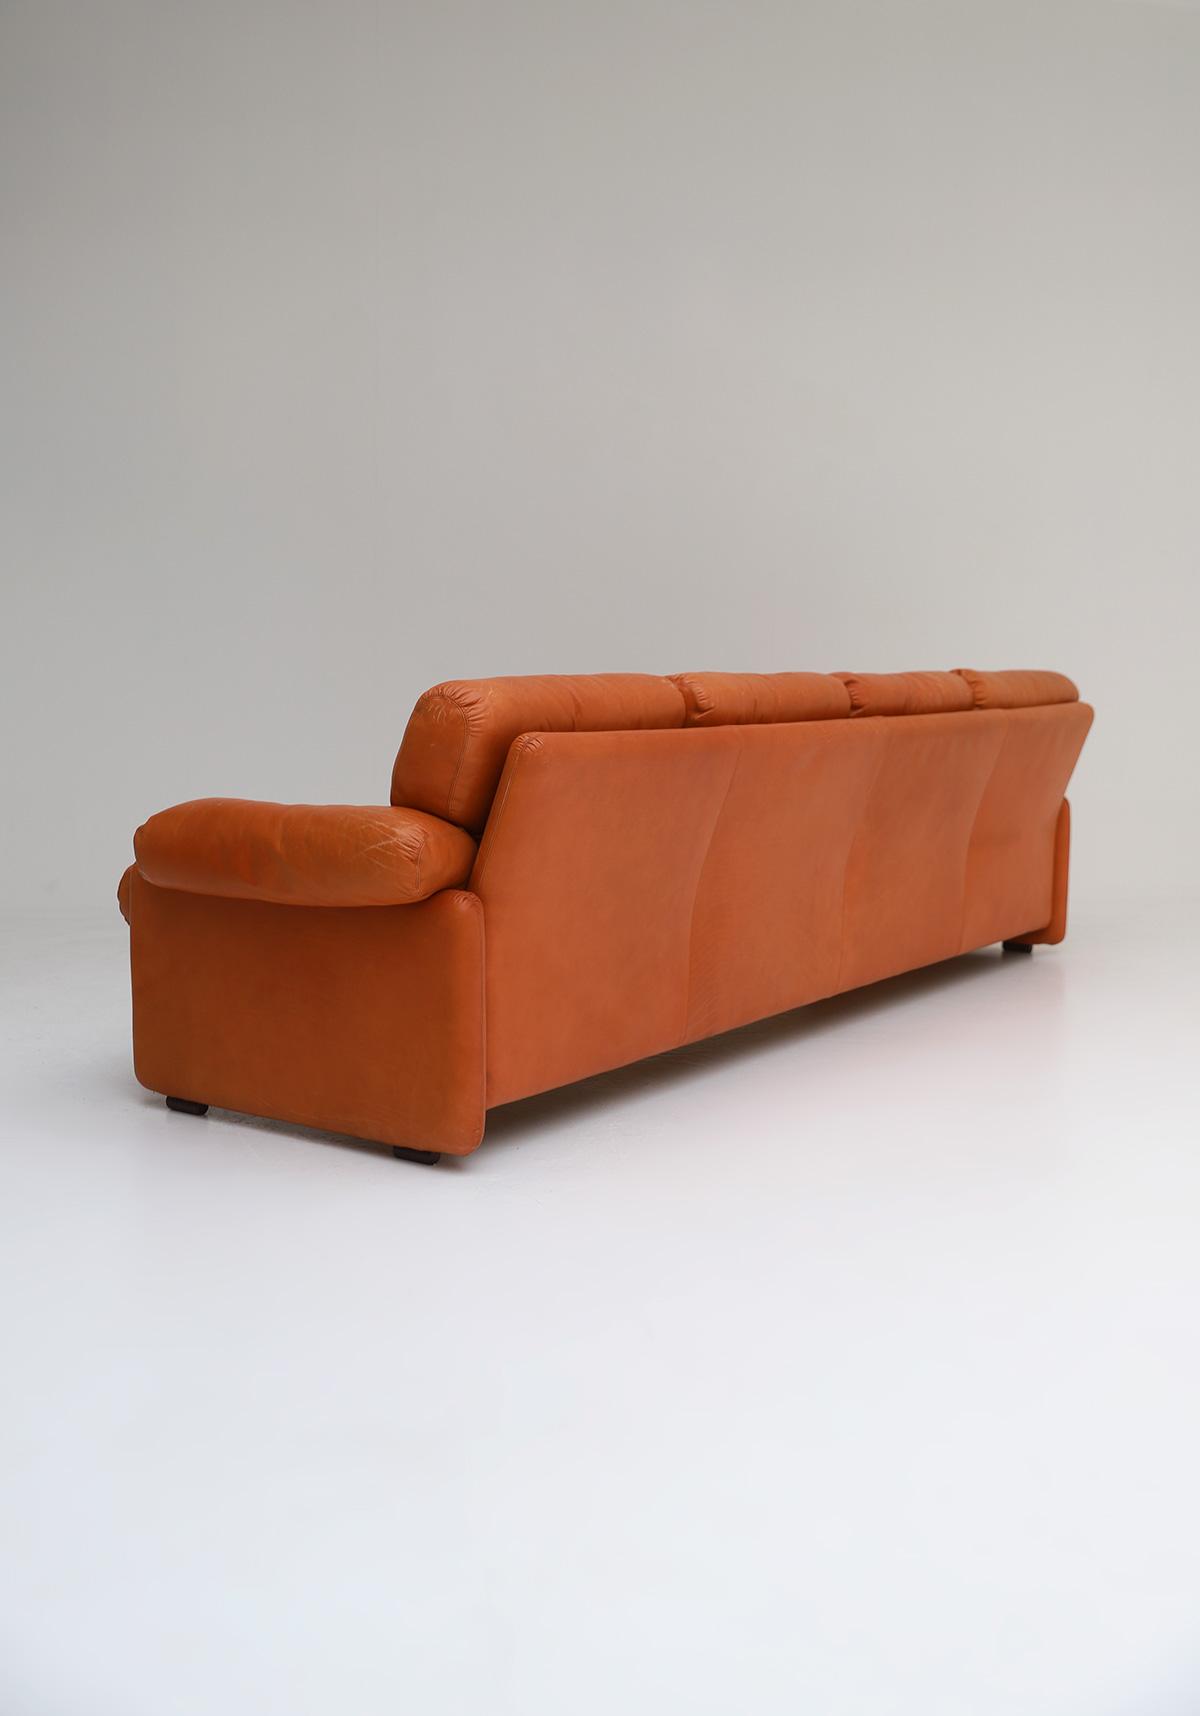 Tobia Scarpa 4 seat Cognac Leather Sofa B&B Italiaimage 6